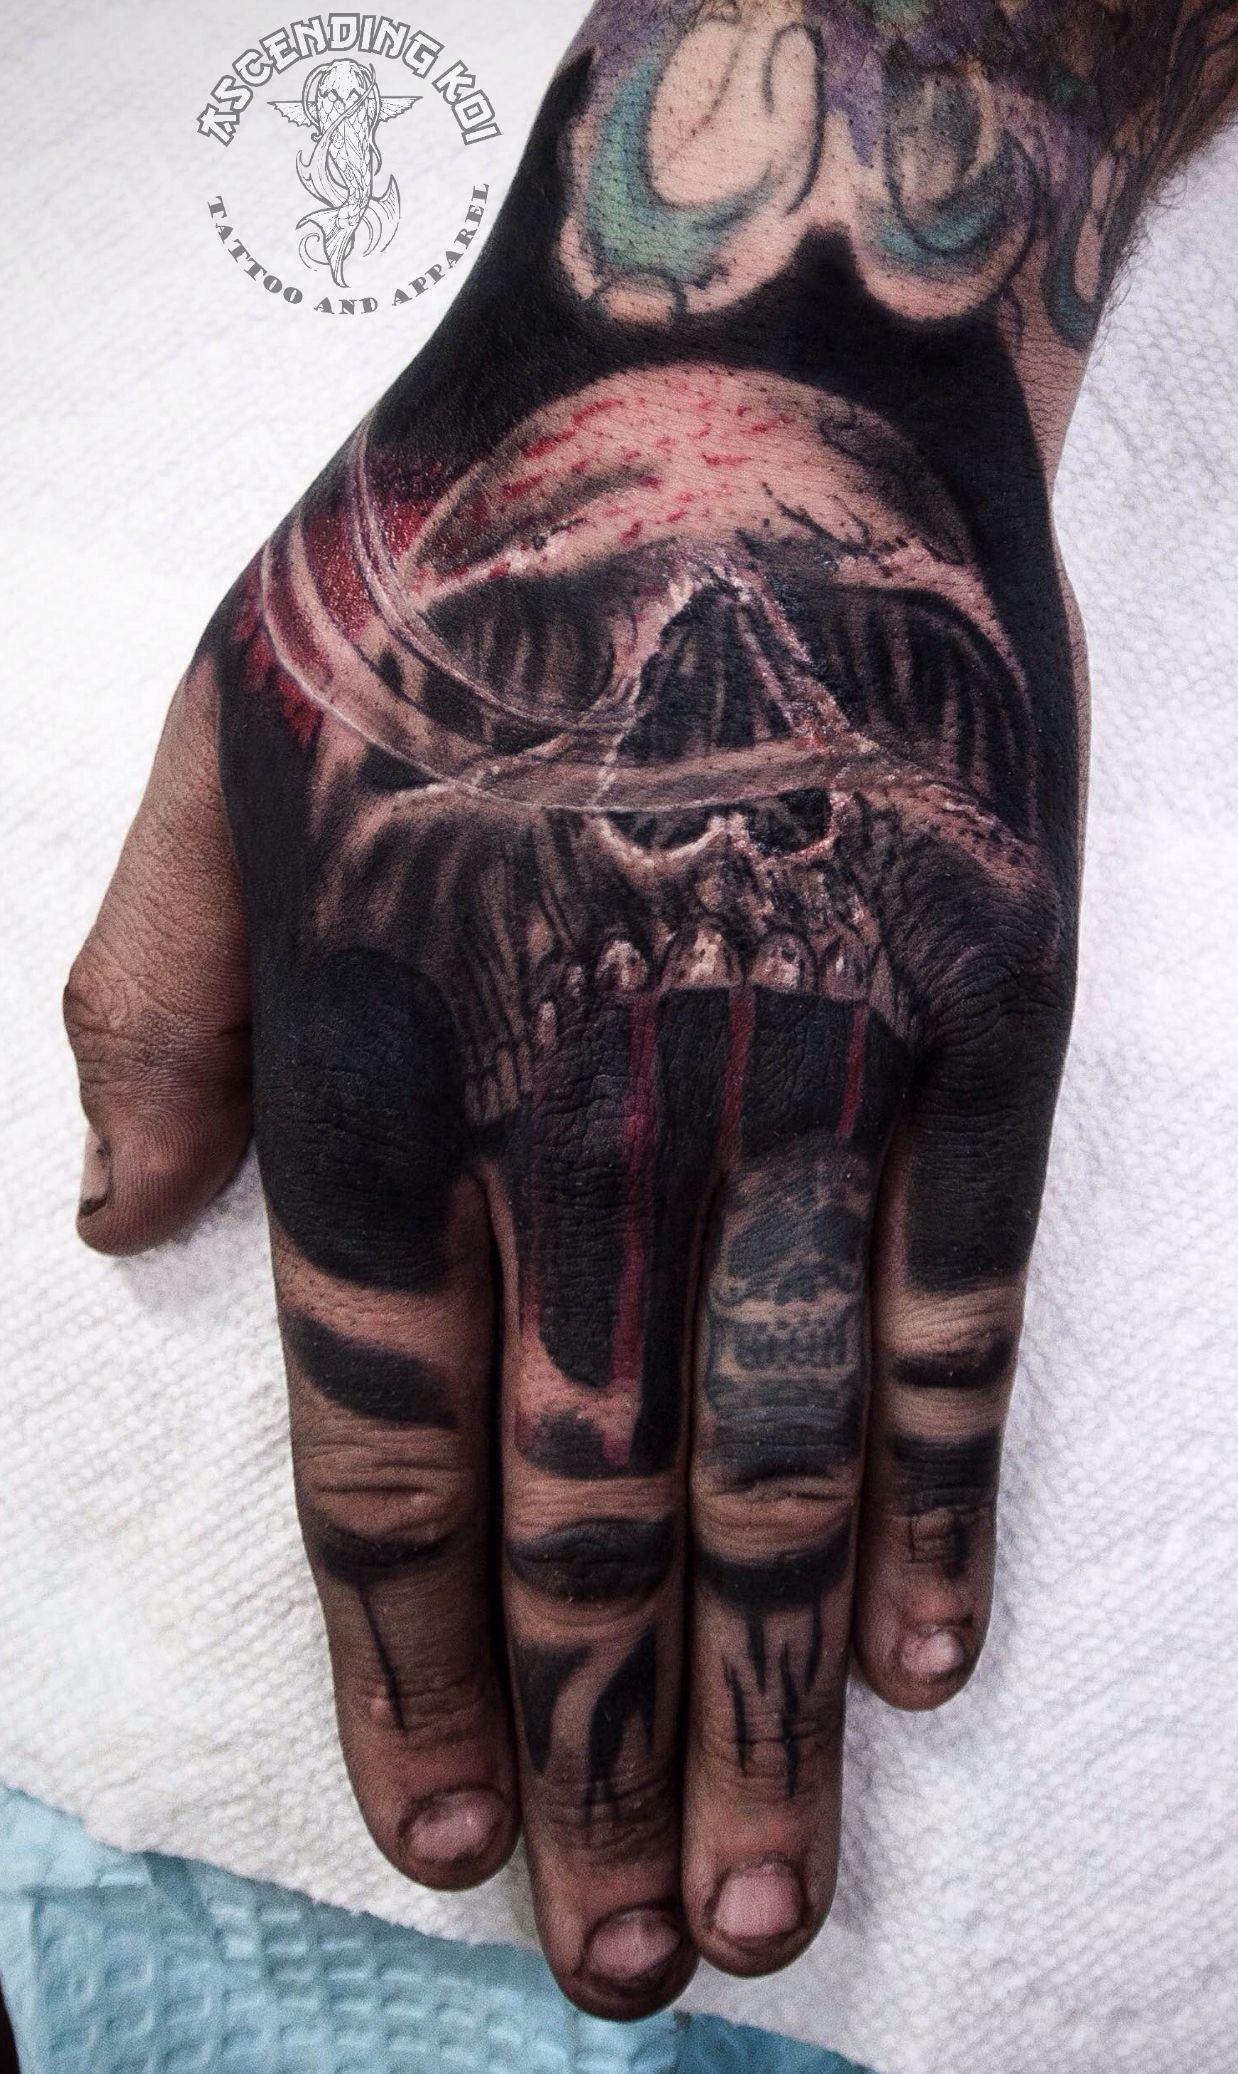 Skull hand tattoo done by Yvonne Koprnicky ascendingkoi